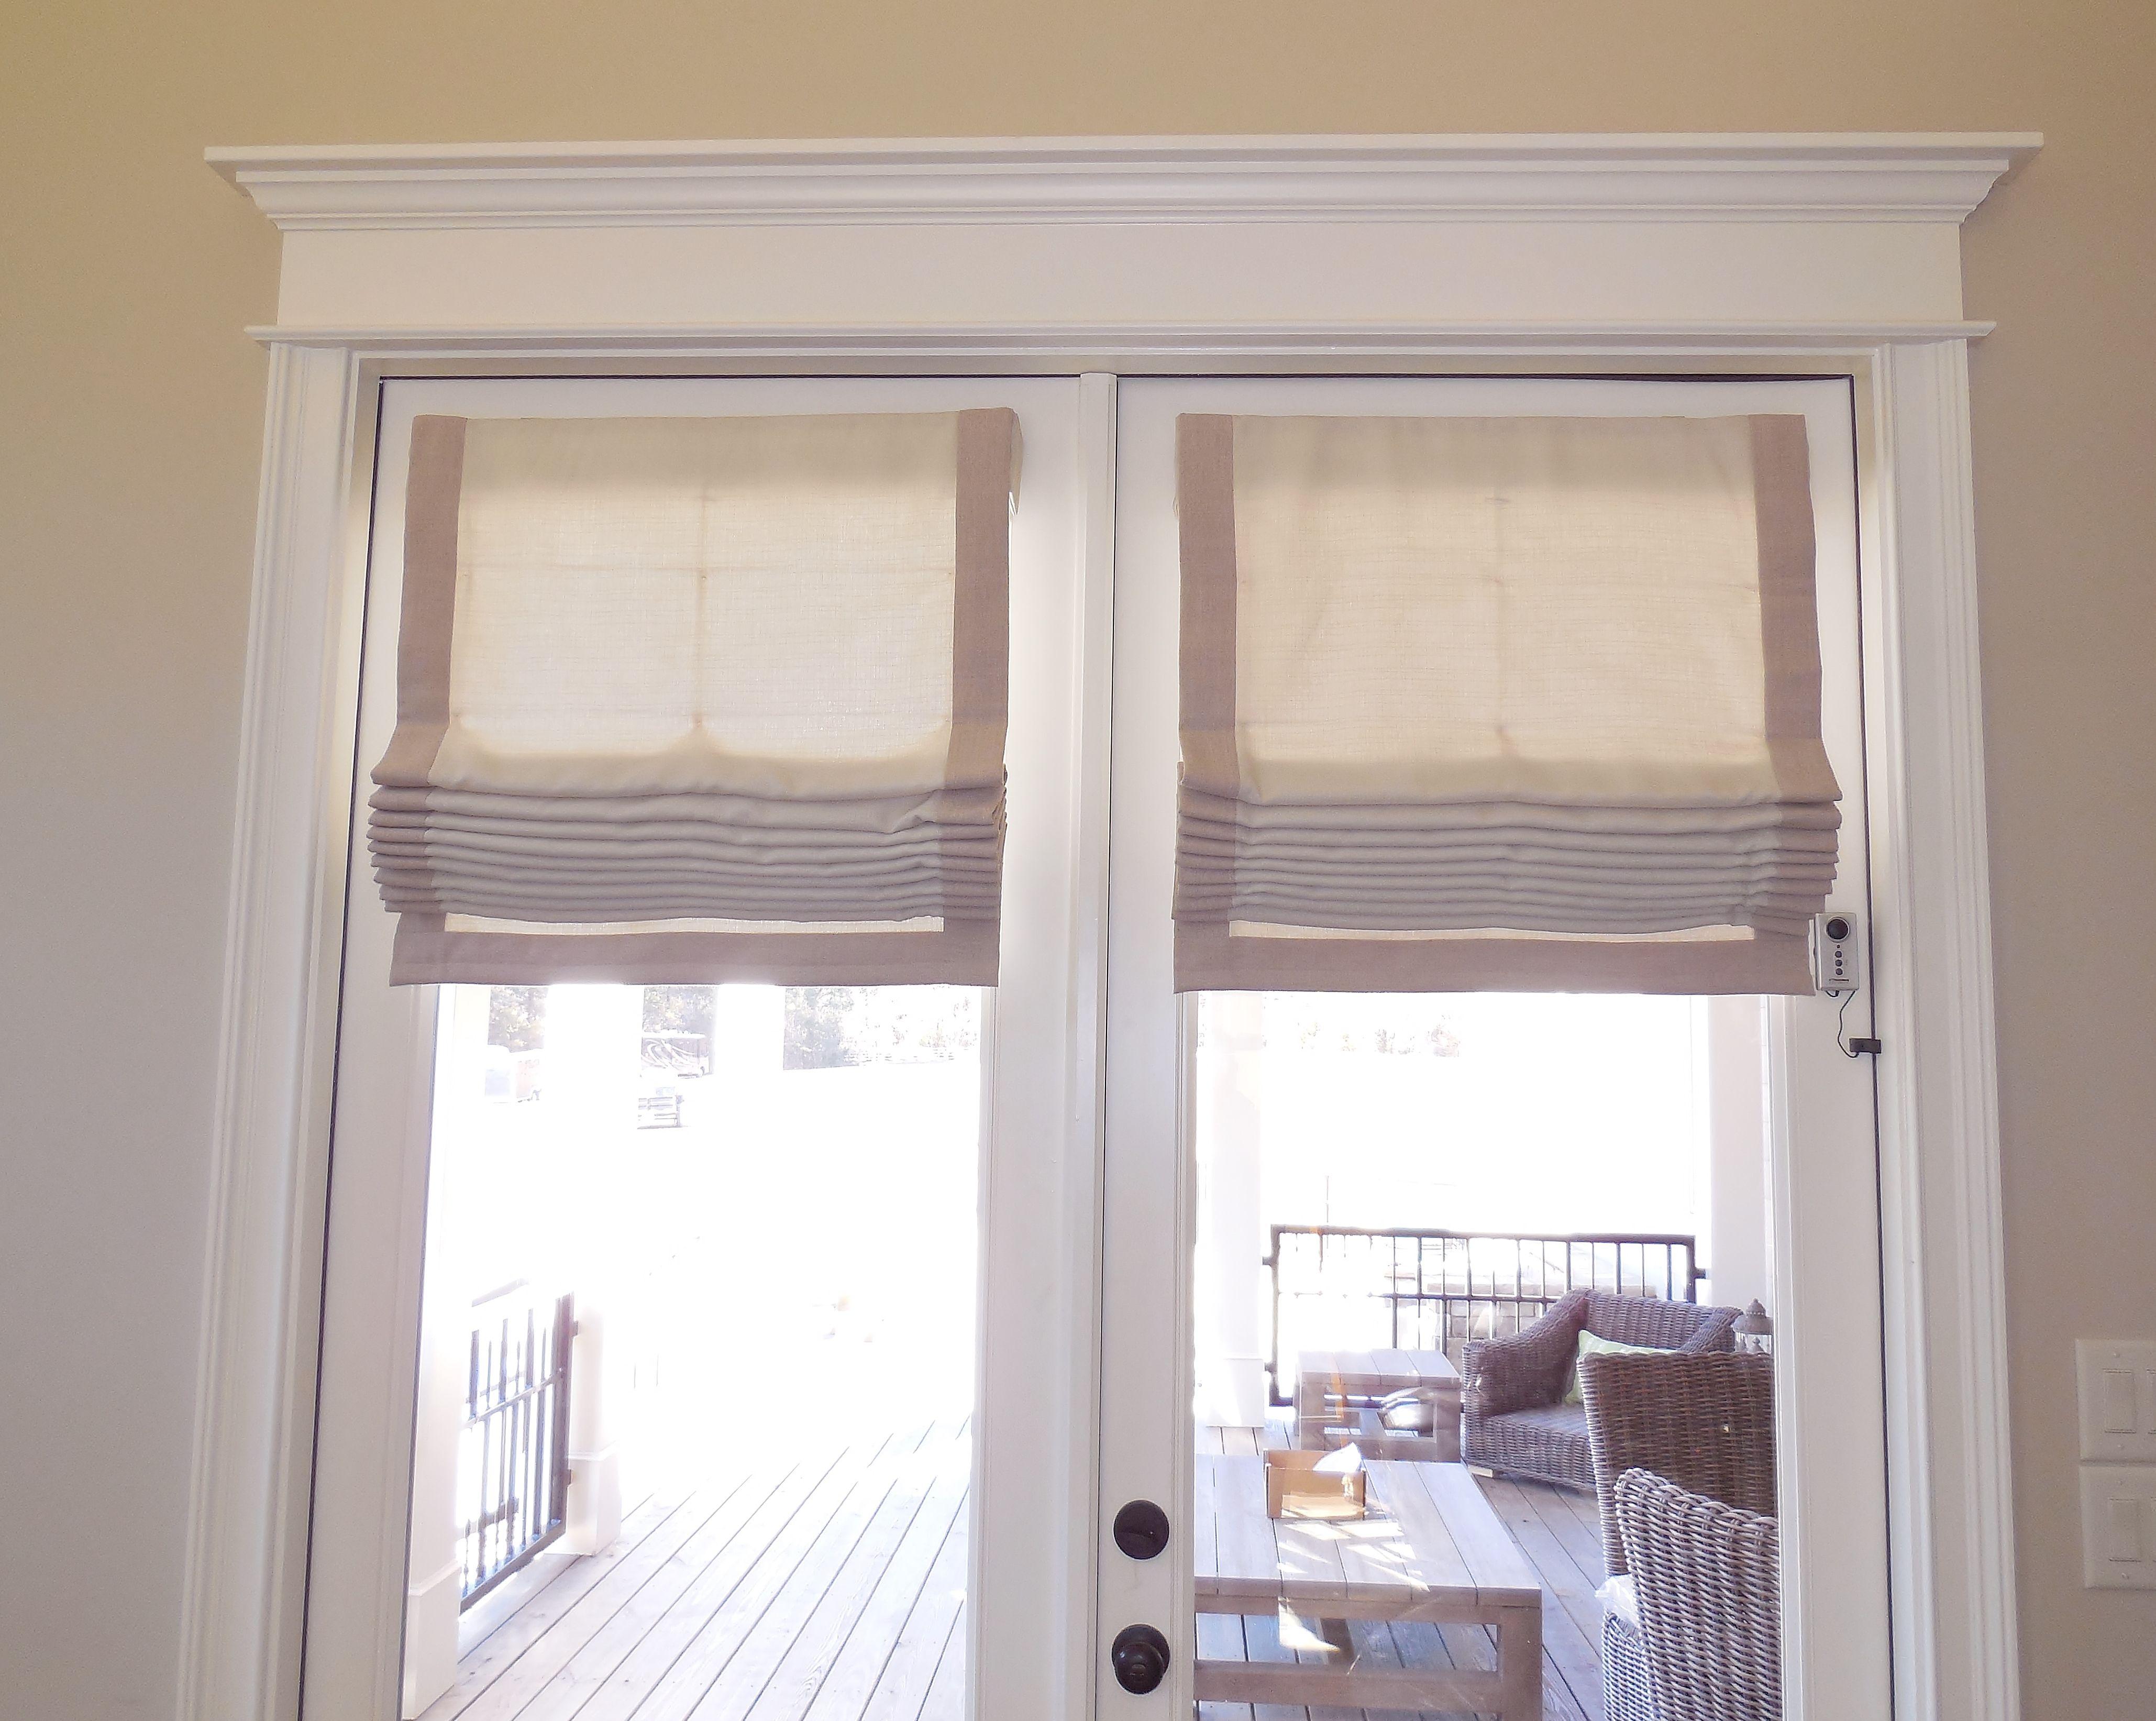 Banded Flat Roman Shades Windowtreatments Www Ladydiannes Com